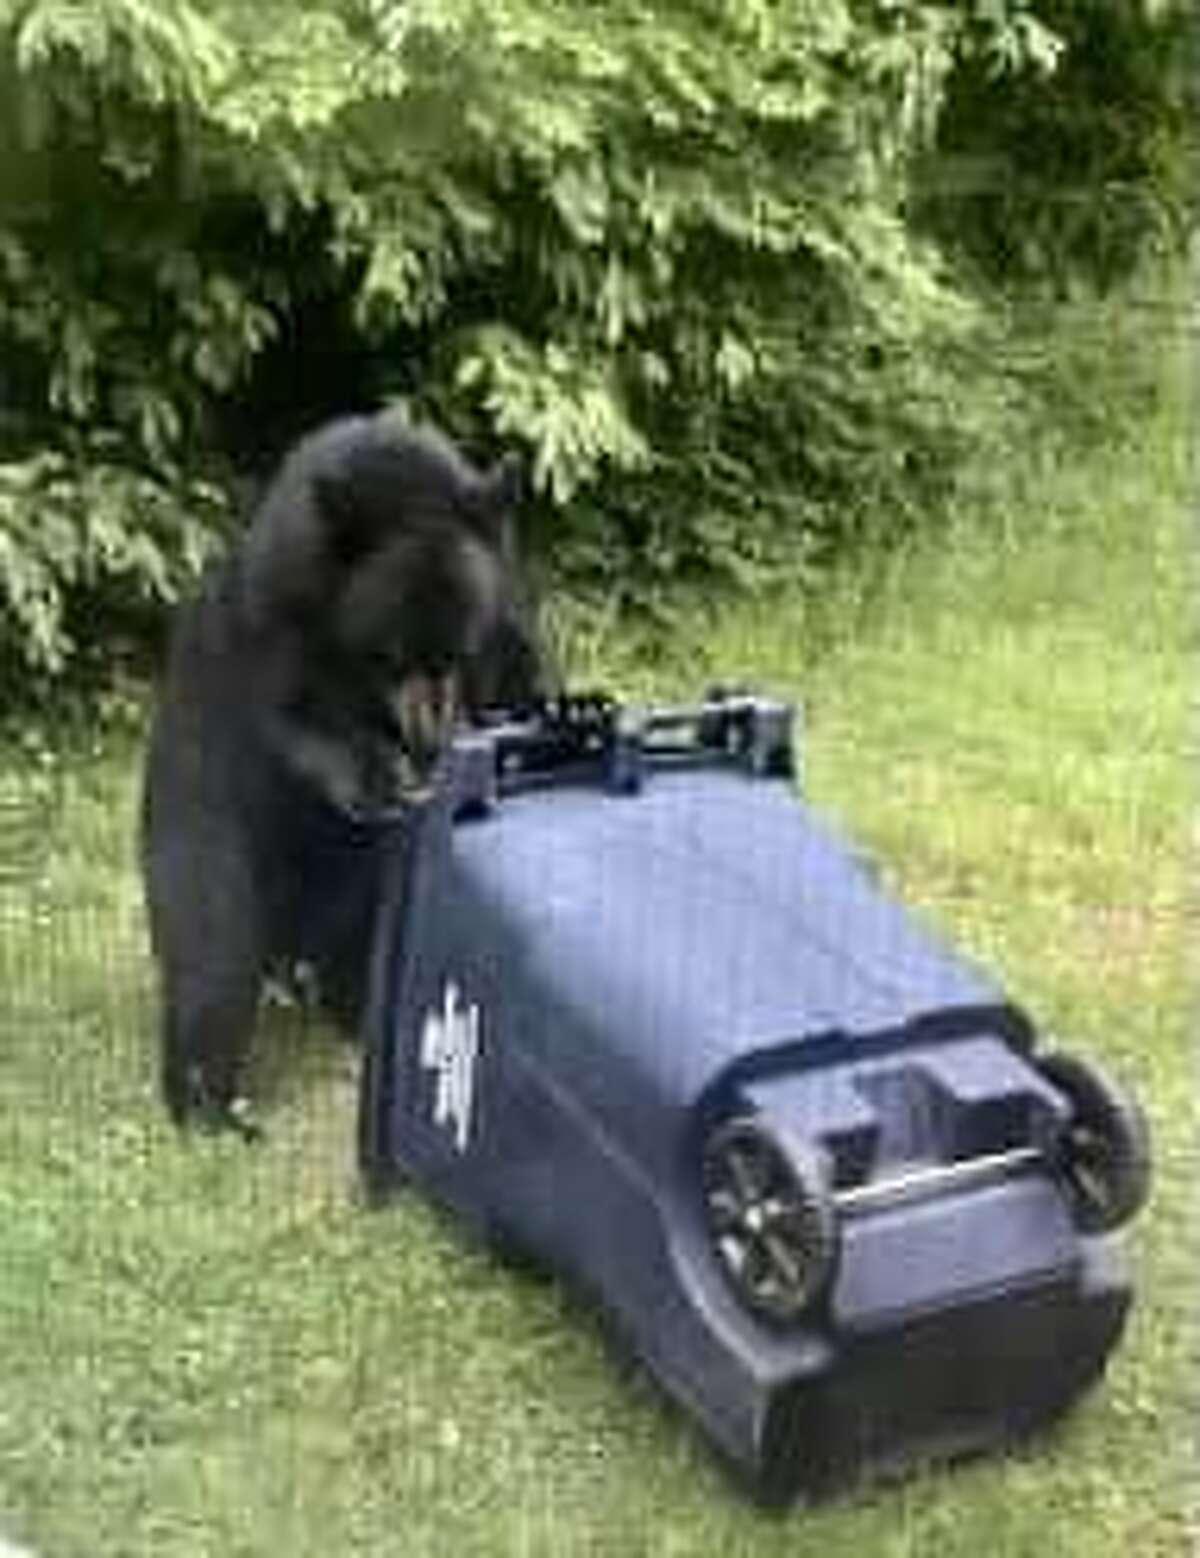 Bear tries to open 32-gallon trash bin